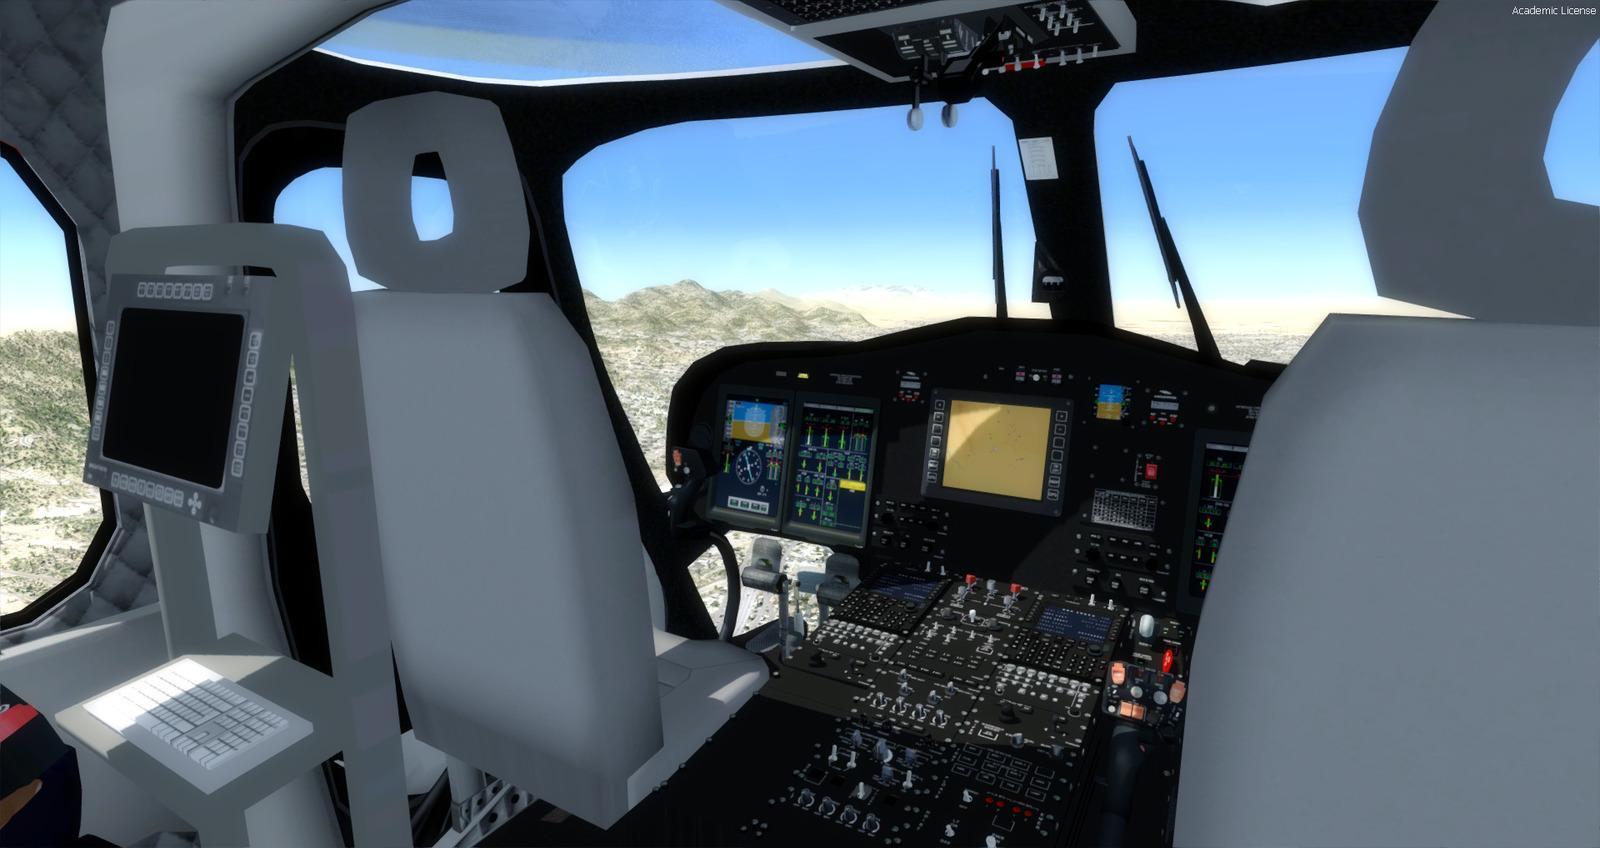 DOWNLOAD AgustaWestland AW139 SAR FSX & P3D - Rikoooo